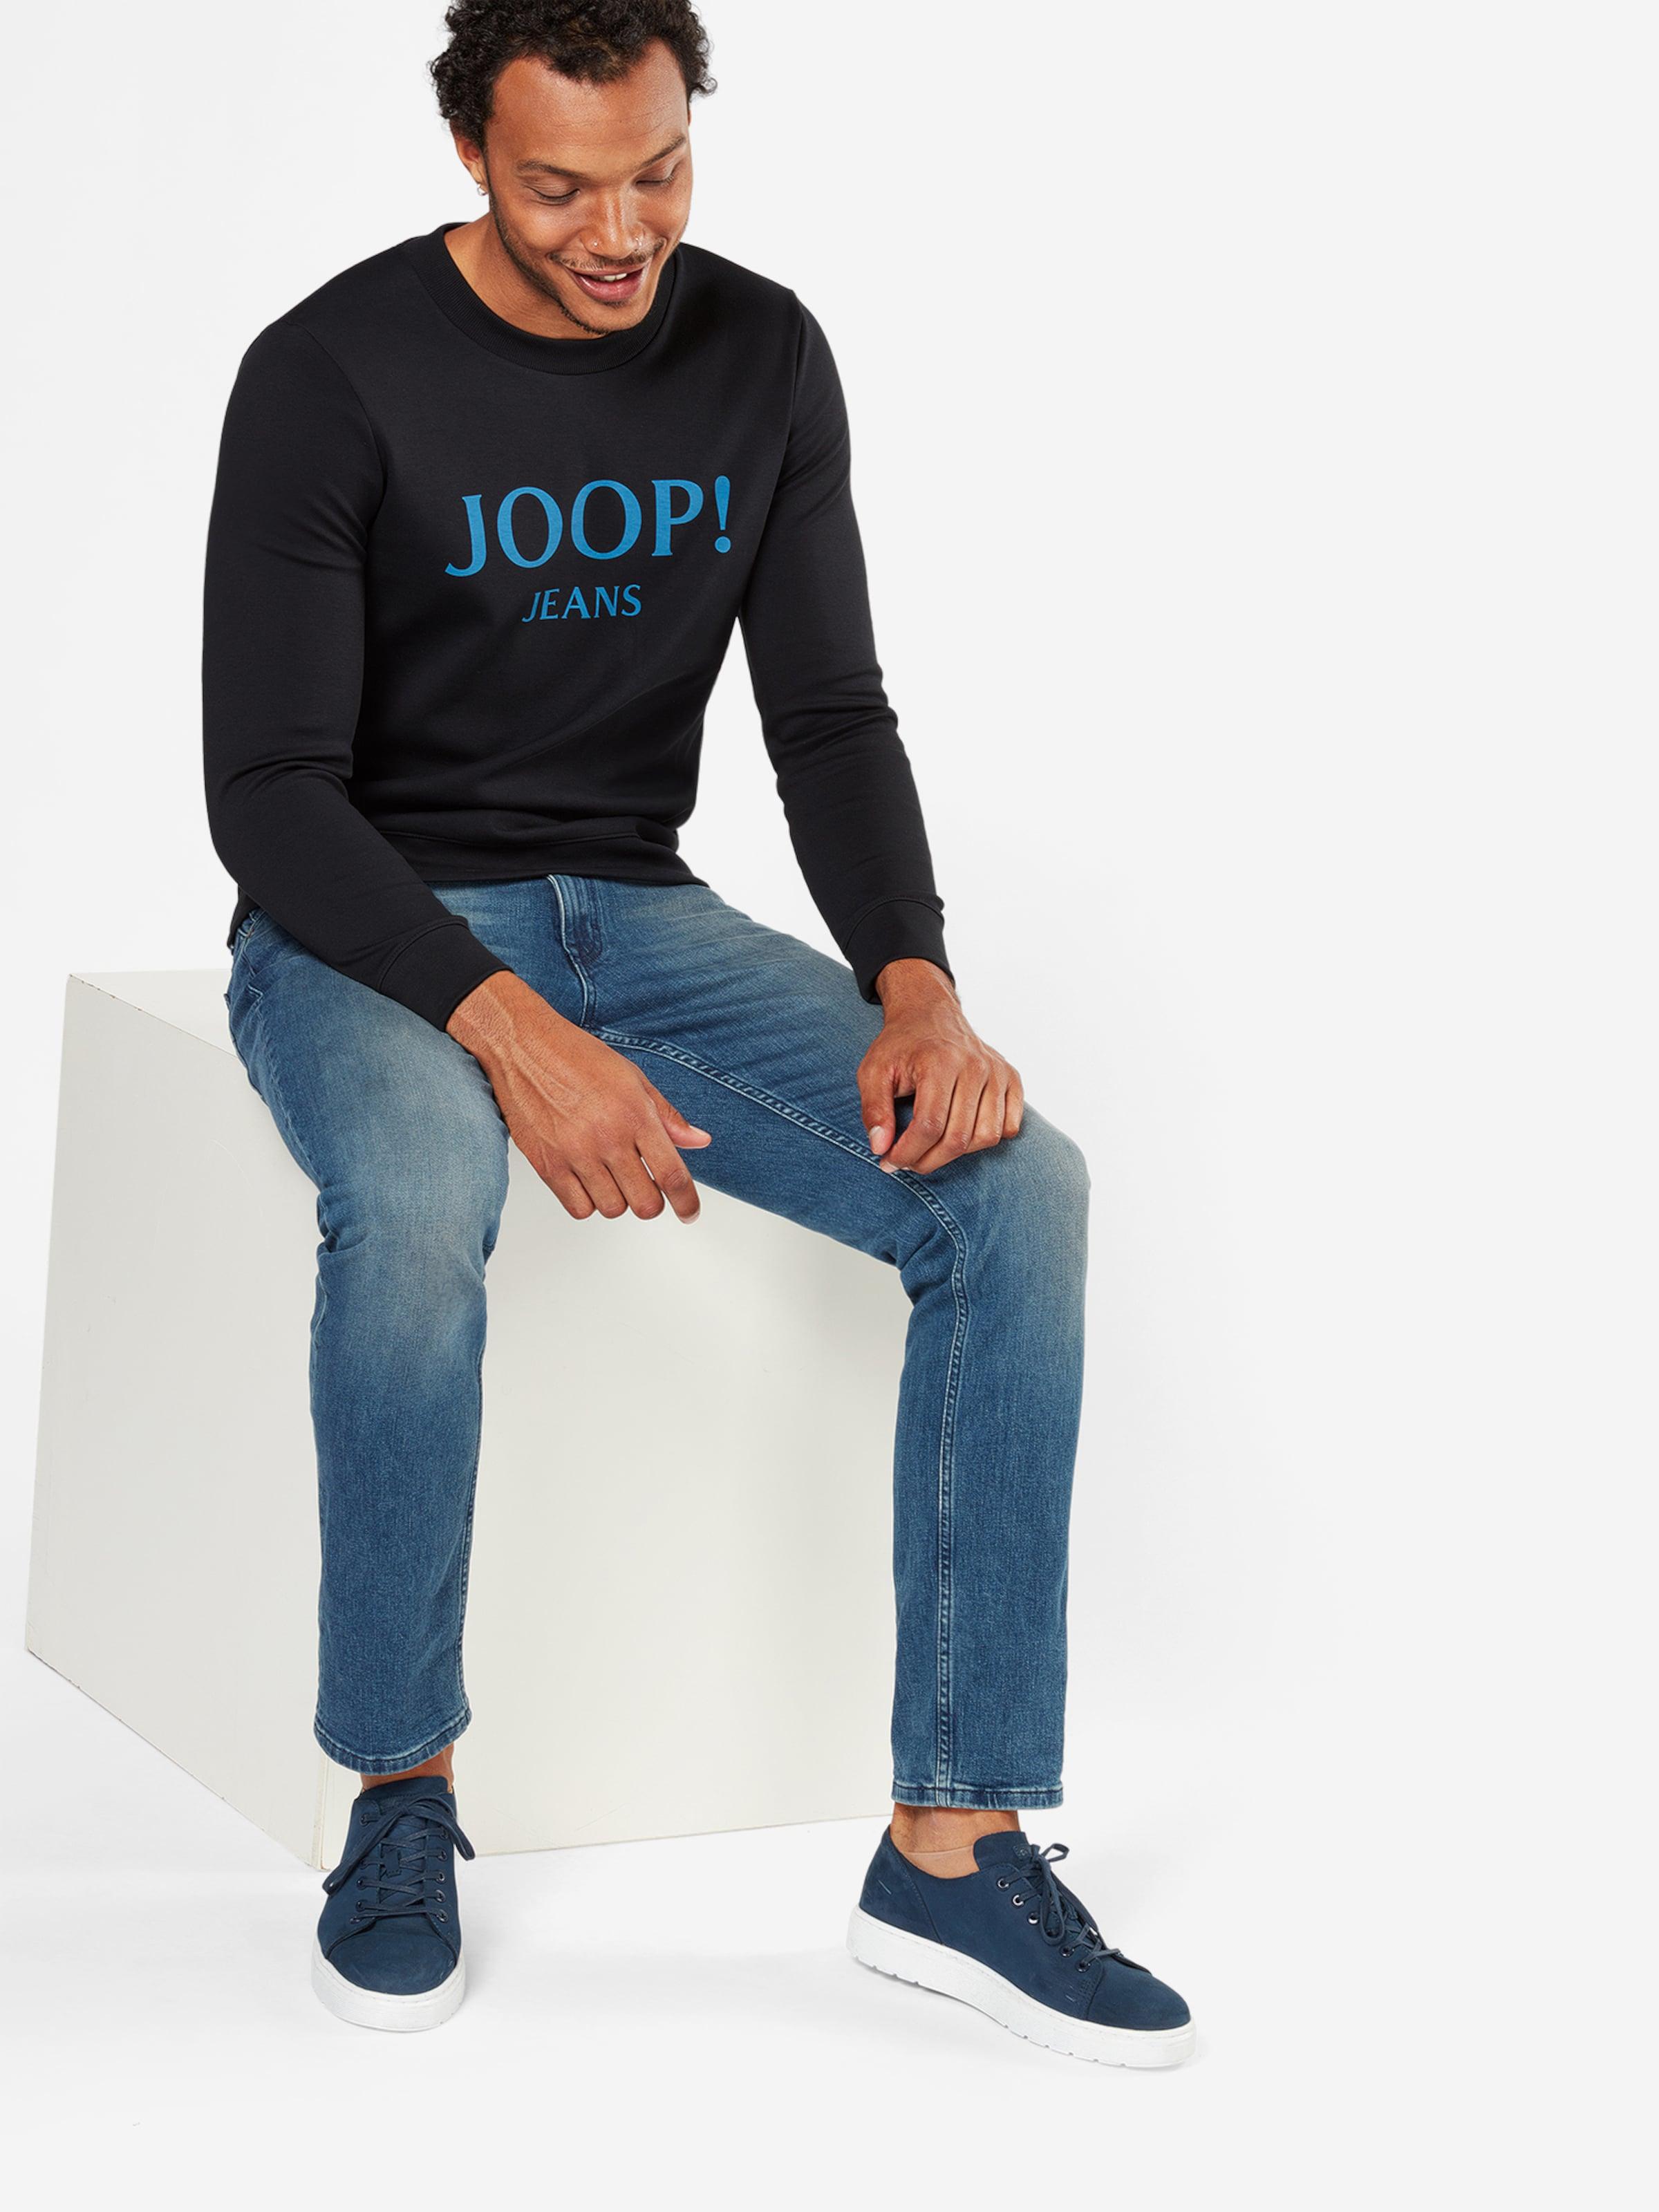 In JoopSweatshirt 'alfred' BlauSchwarz In JoopSweatshirt 'alfred' mNwOnv80